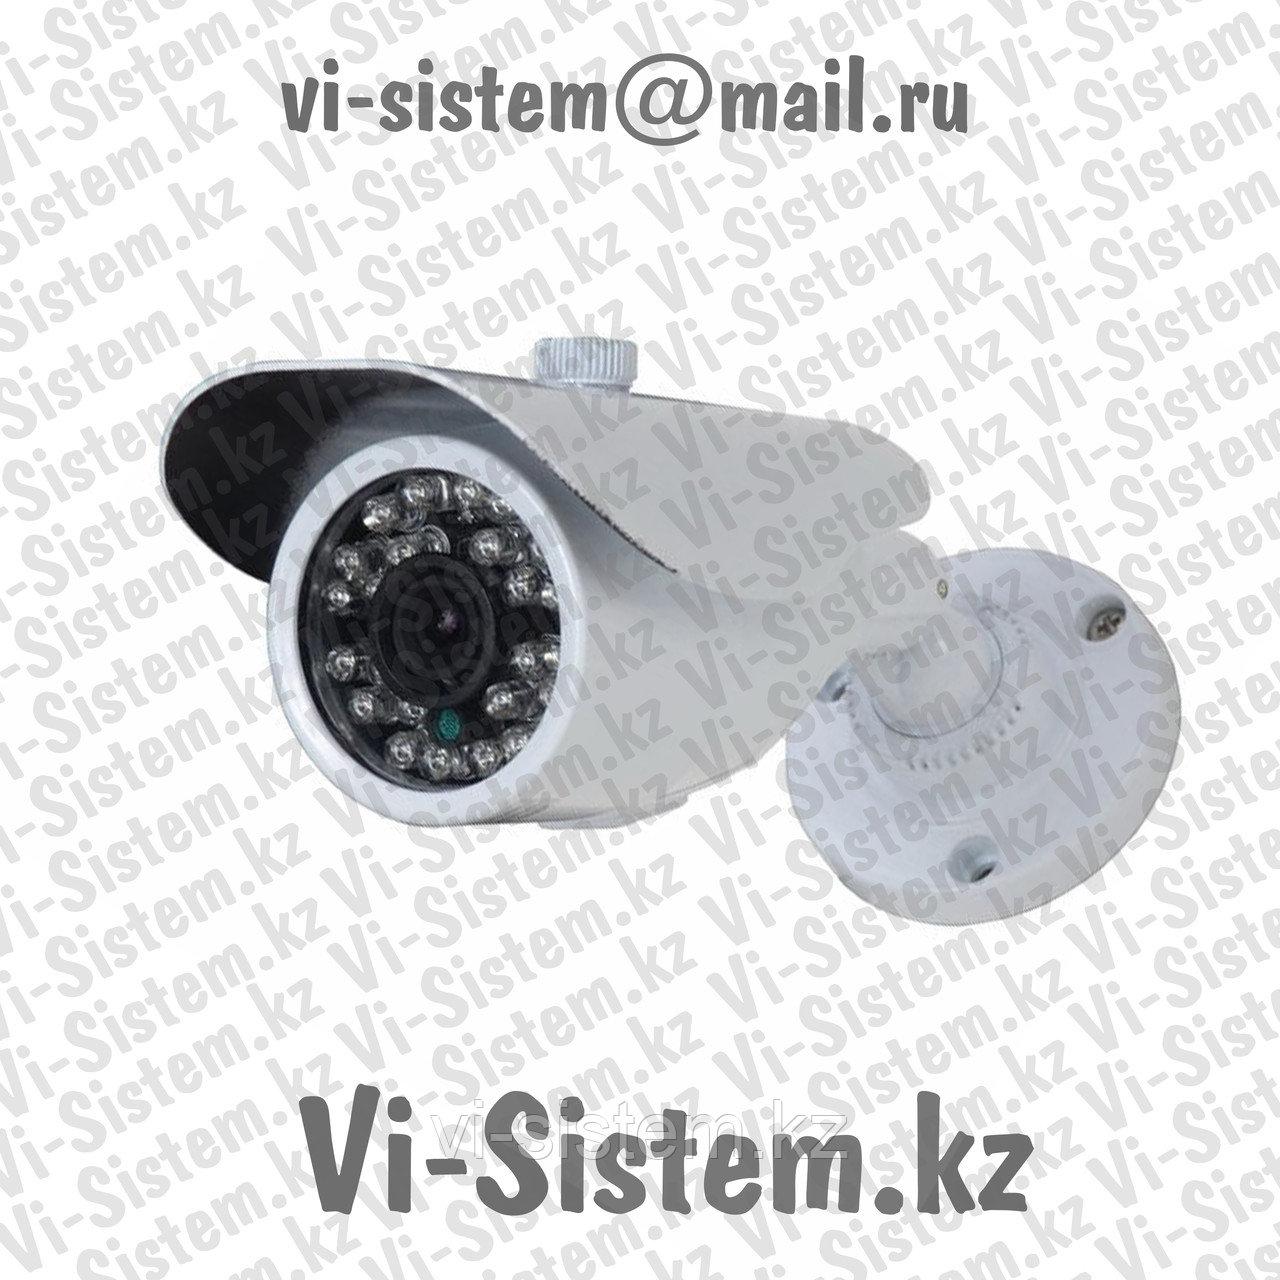 AHD-Видеокамера SYNCAR SY-770 2MP